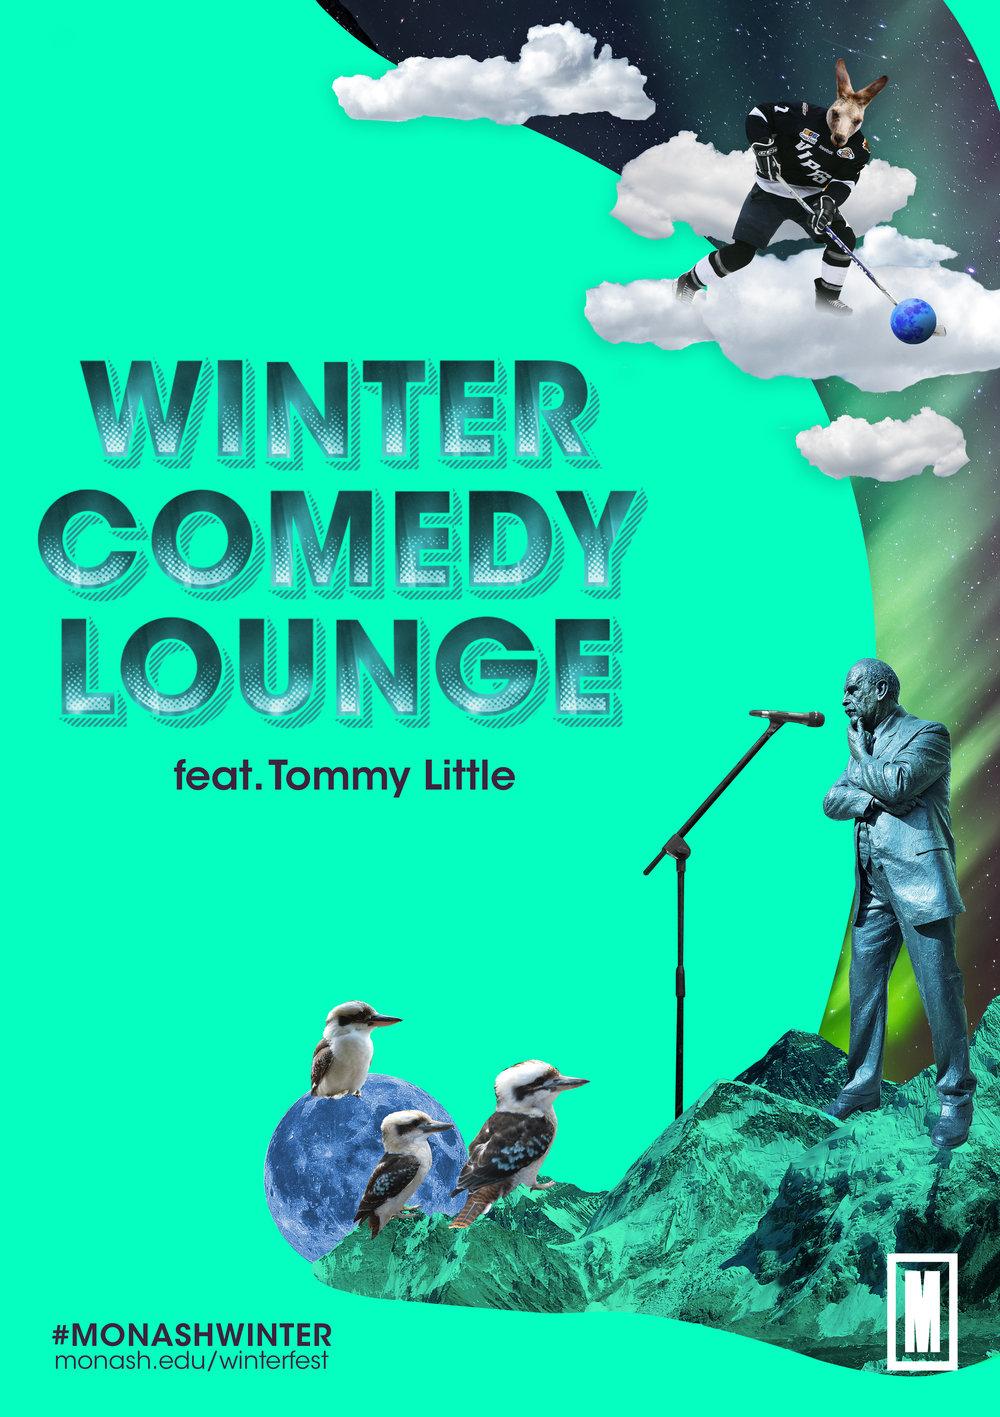 WinterFest-Comedy-A3poster-13062017.jpg